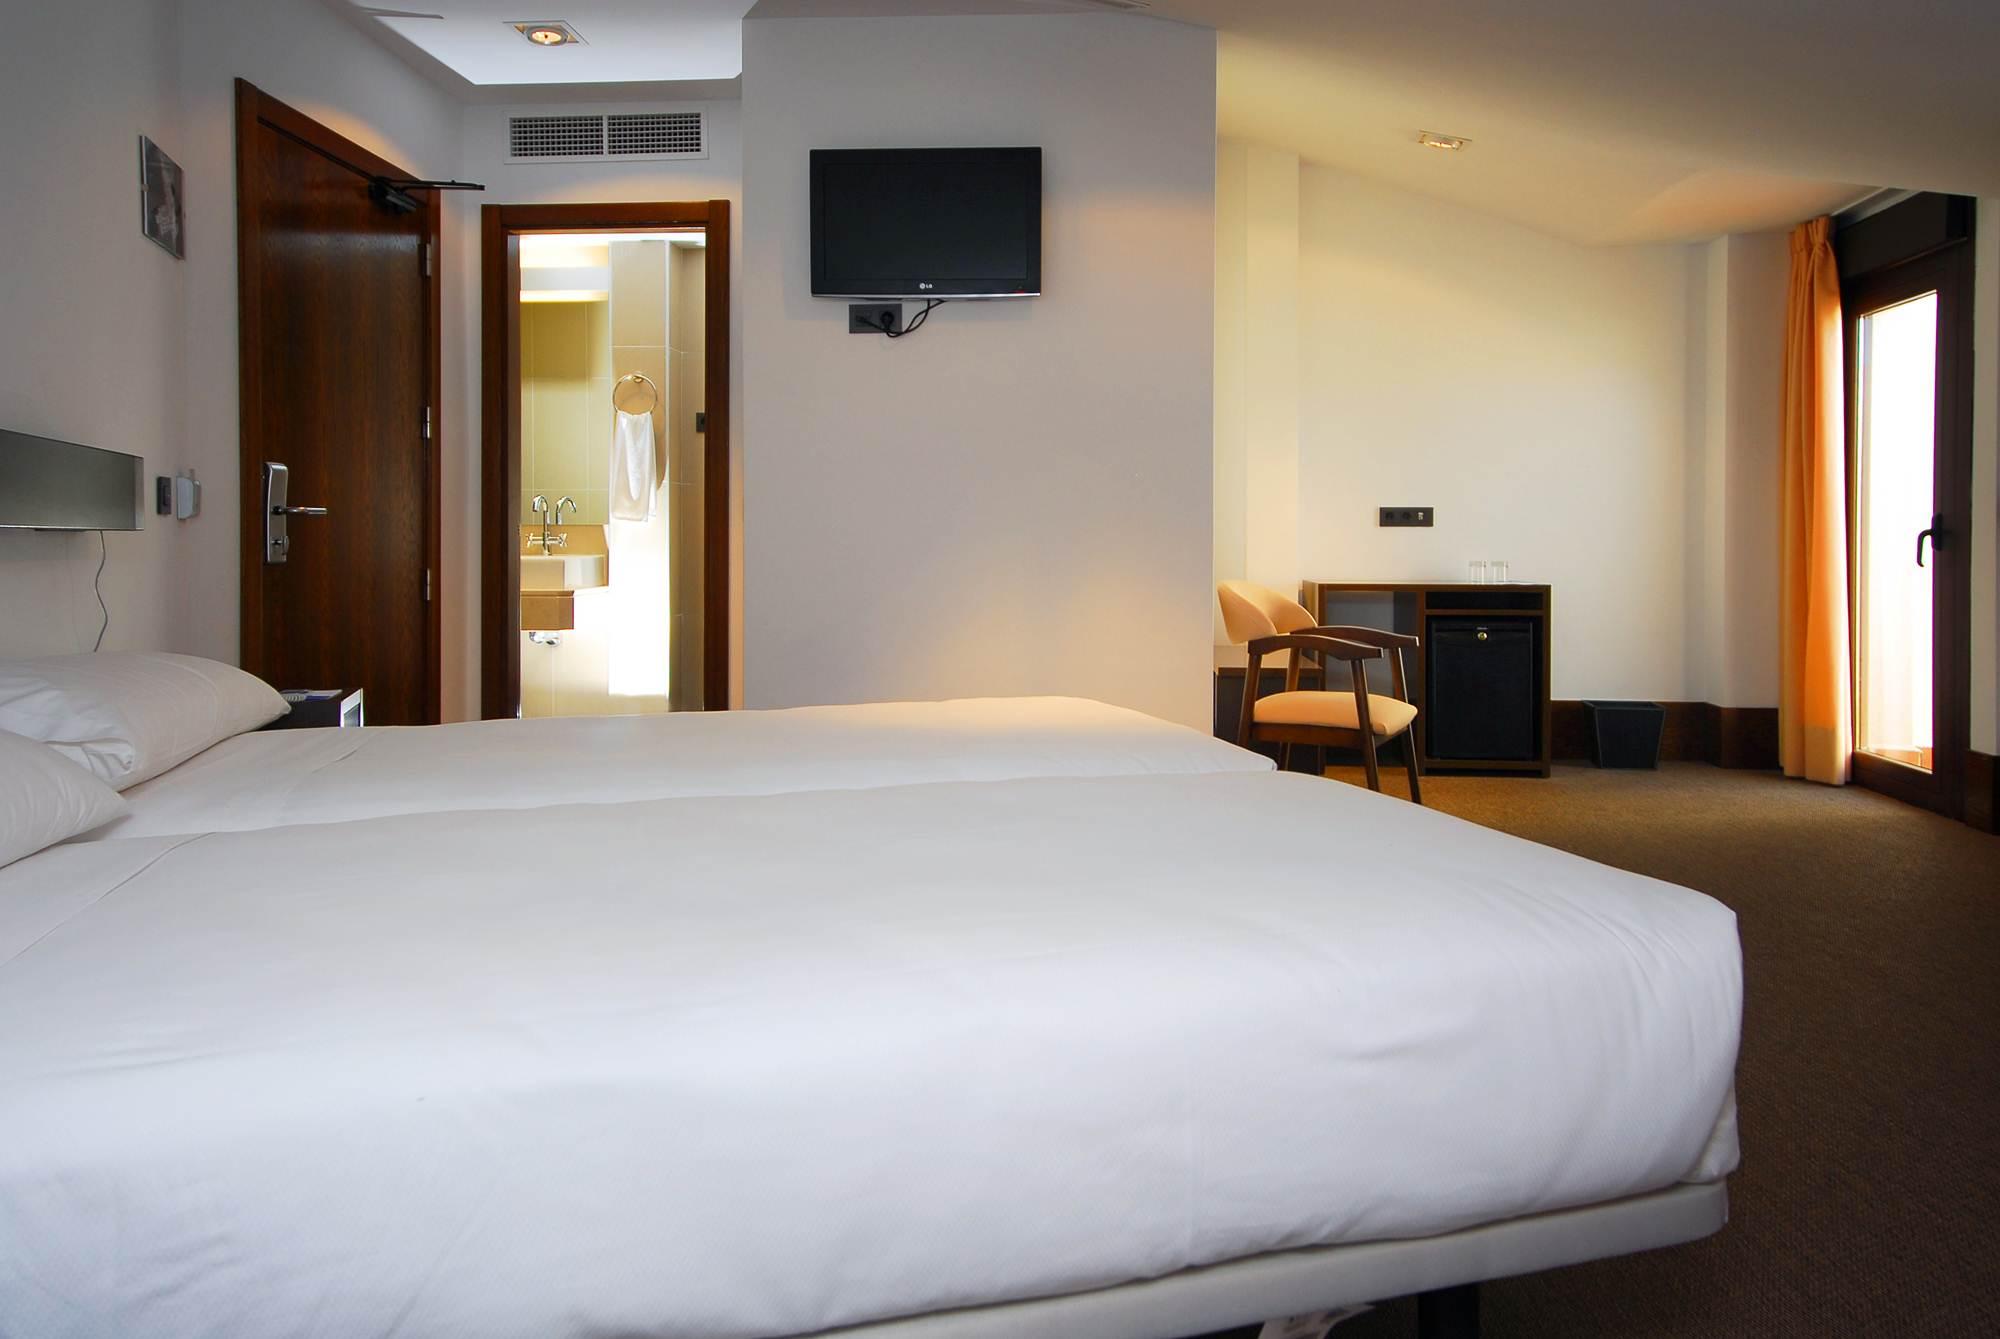 Fotos del hotel - DOMUS PLAZA ZOCODOVER